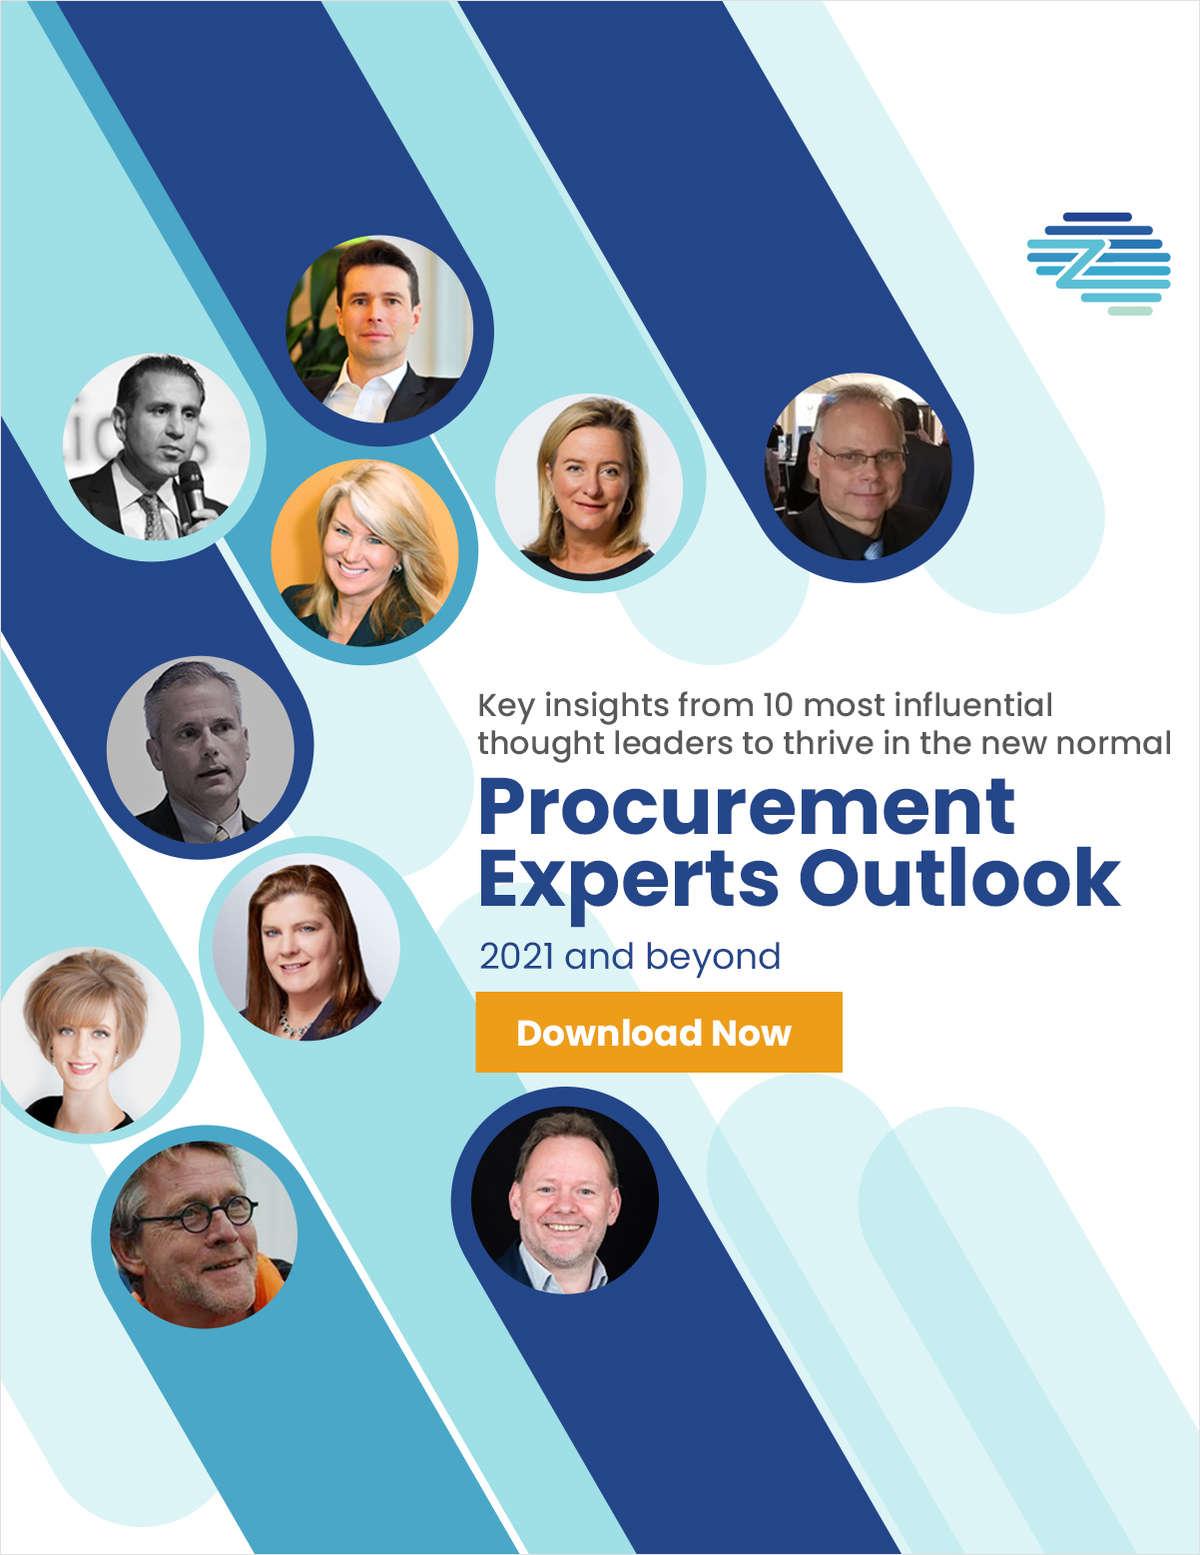 Procurement Experts Outlook 2021